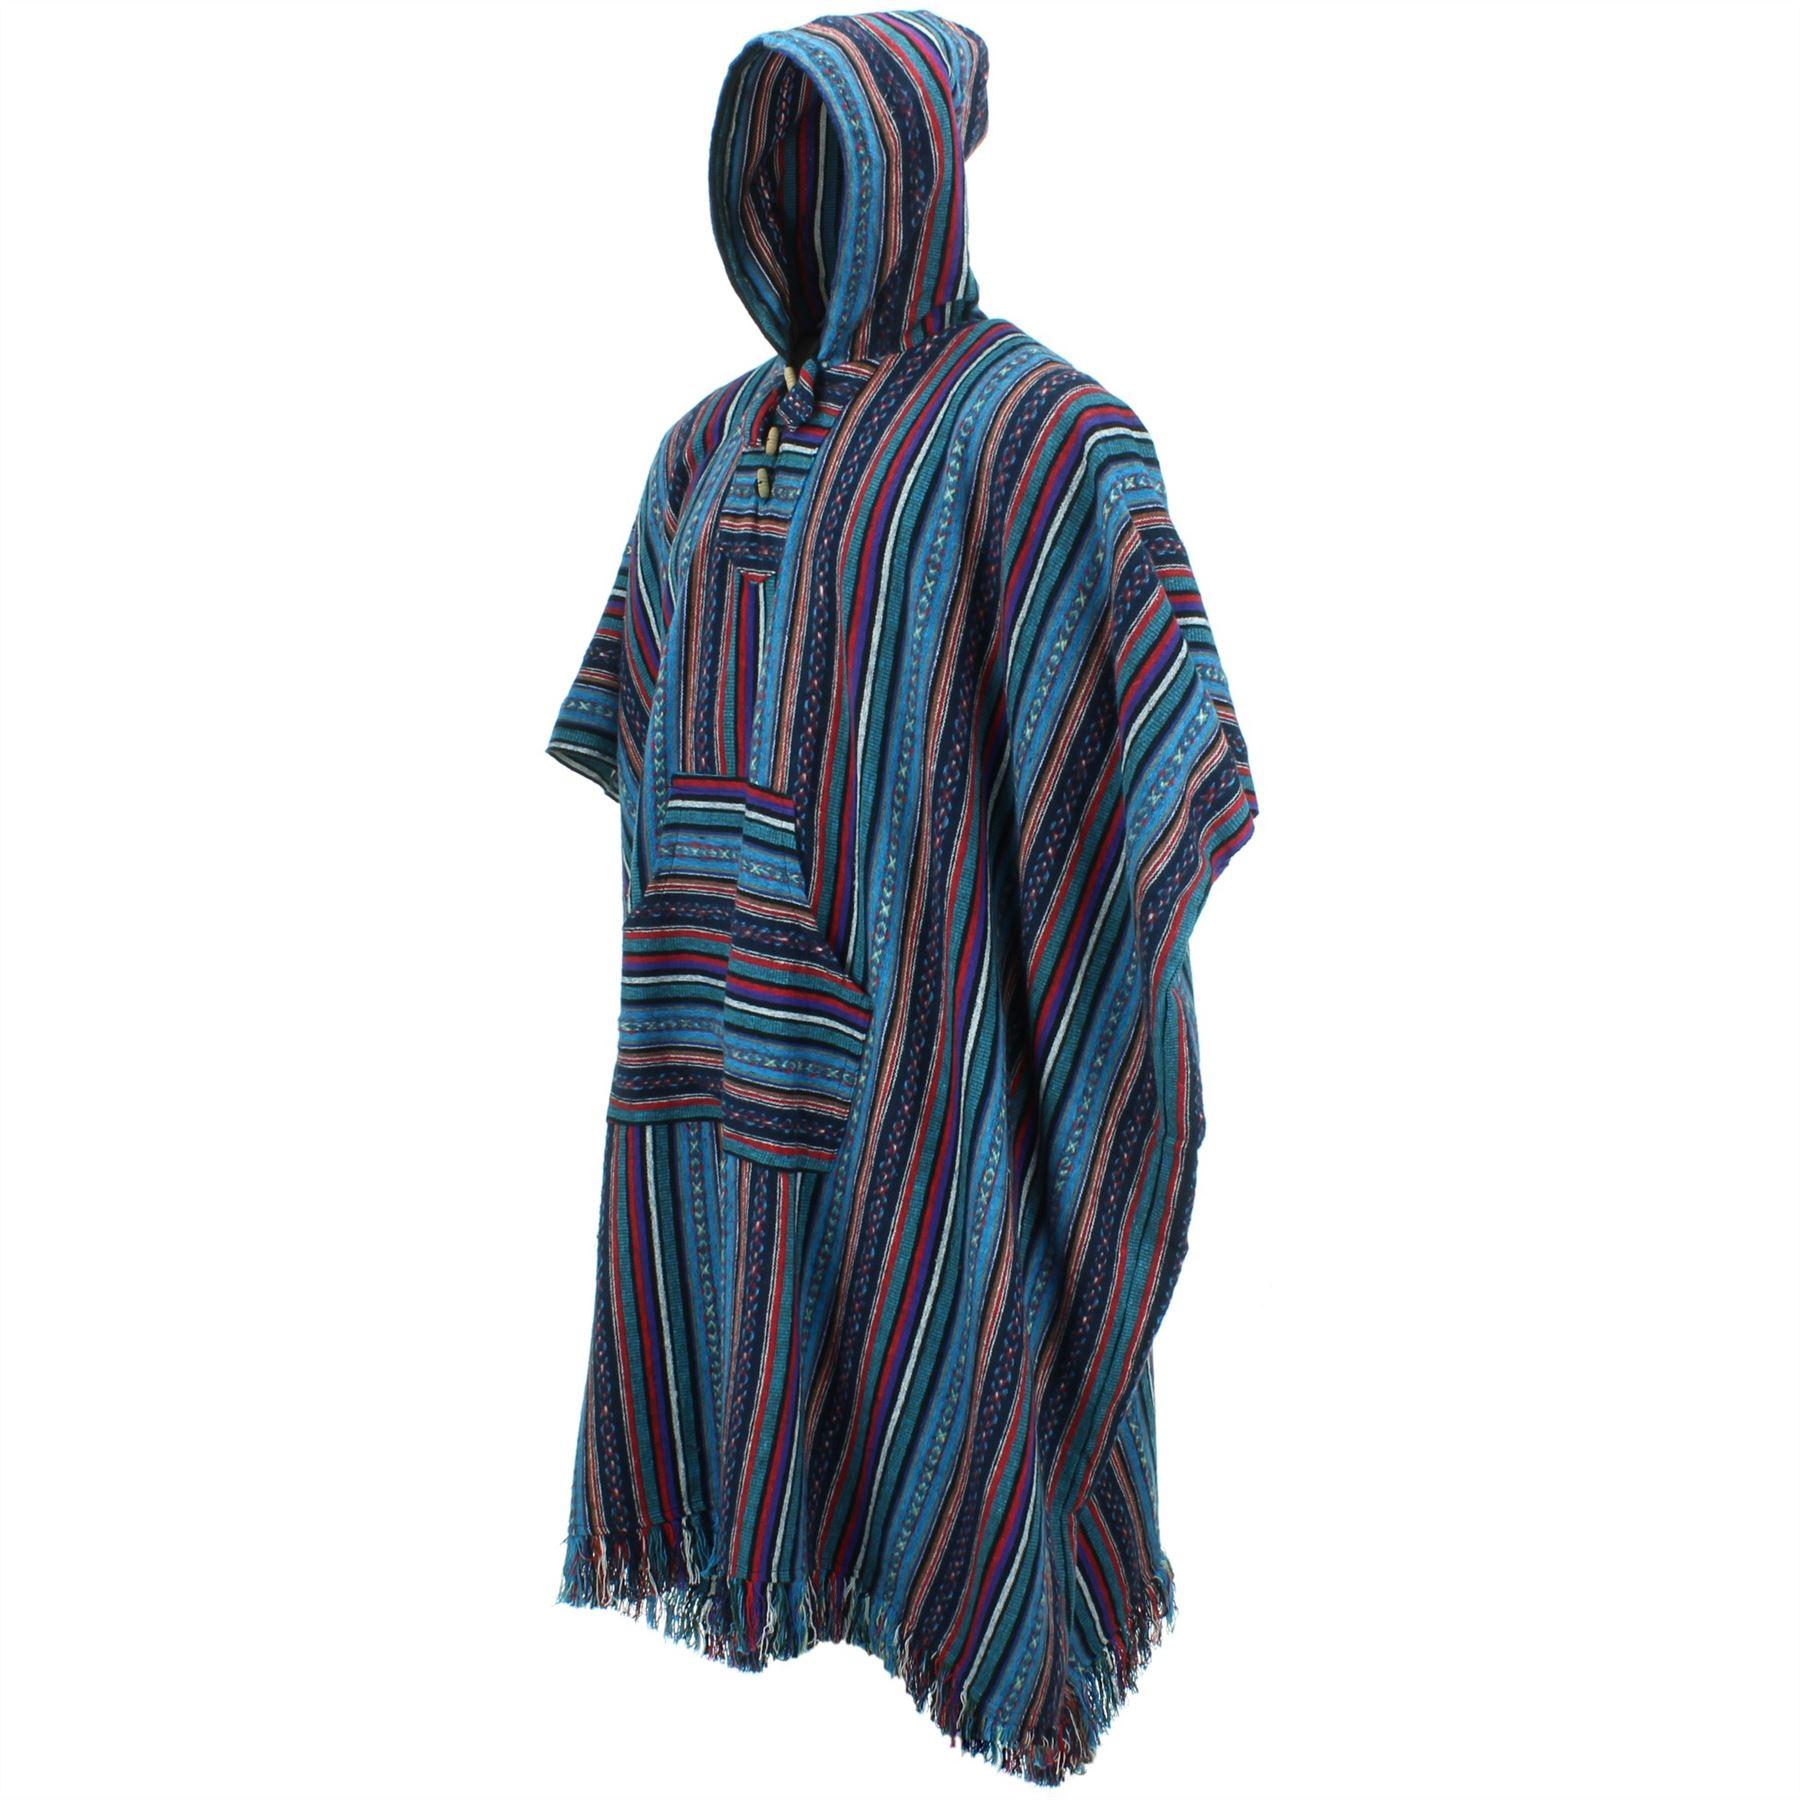 Poncho-Hooded-Cape-Cotton-Warm-Festival-Long-Woven-Rainbow-Men-Women thumbnail 12